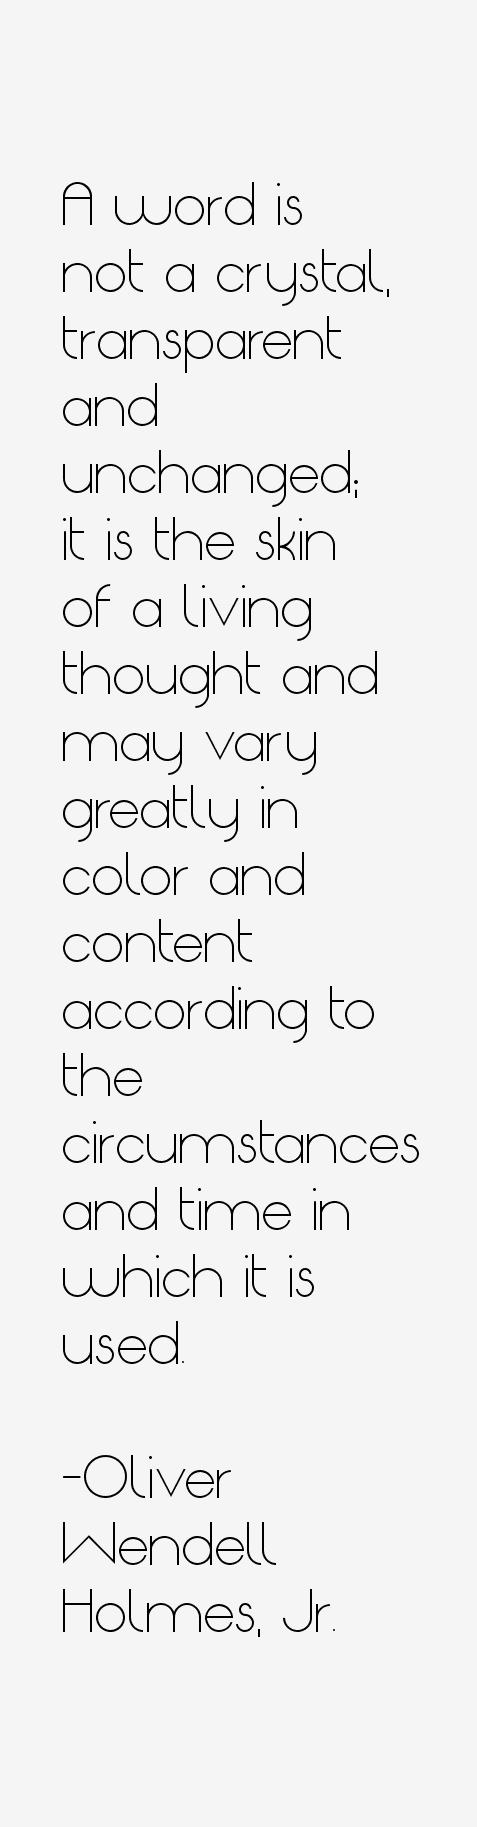 Oliver Wendell Holmes, Jr. Quotes